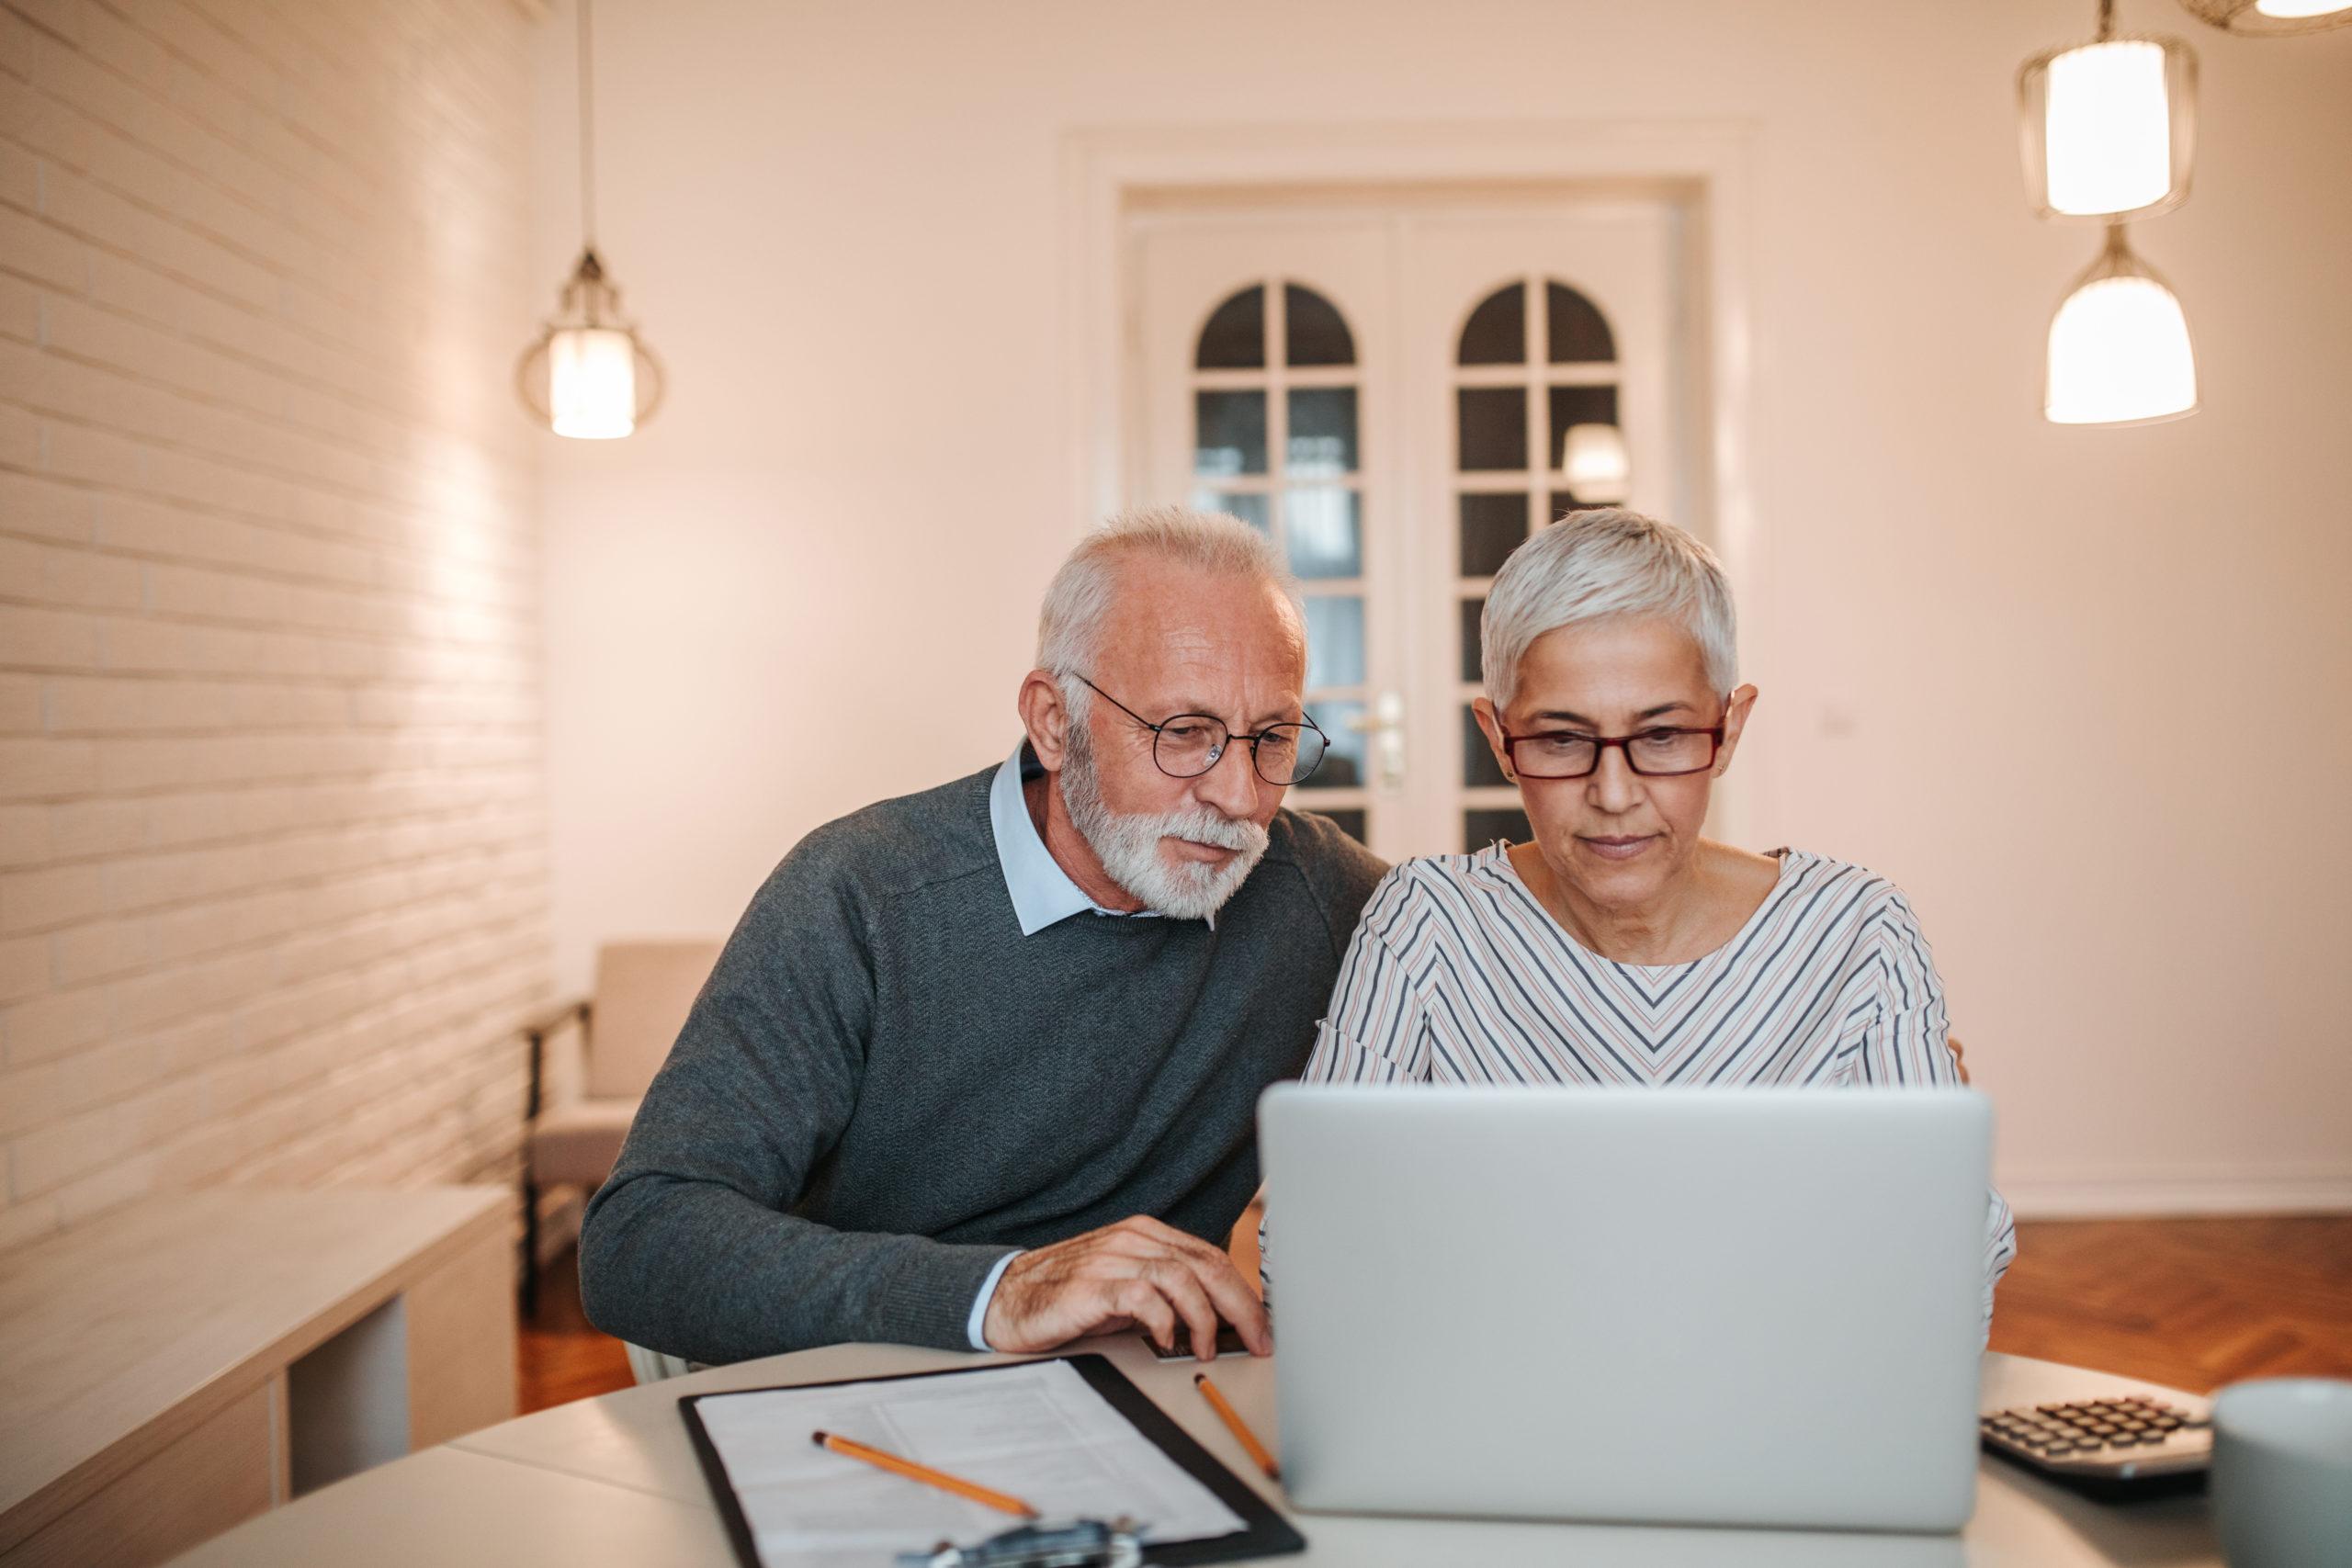 elderly couple utilizing UKRFCU digital services